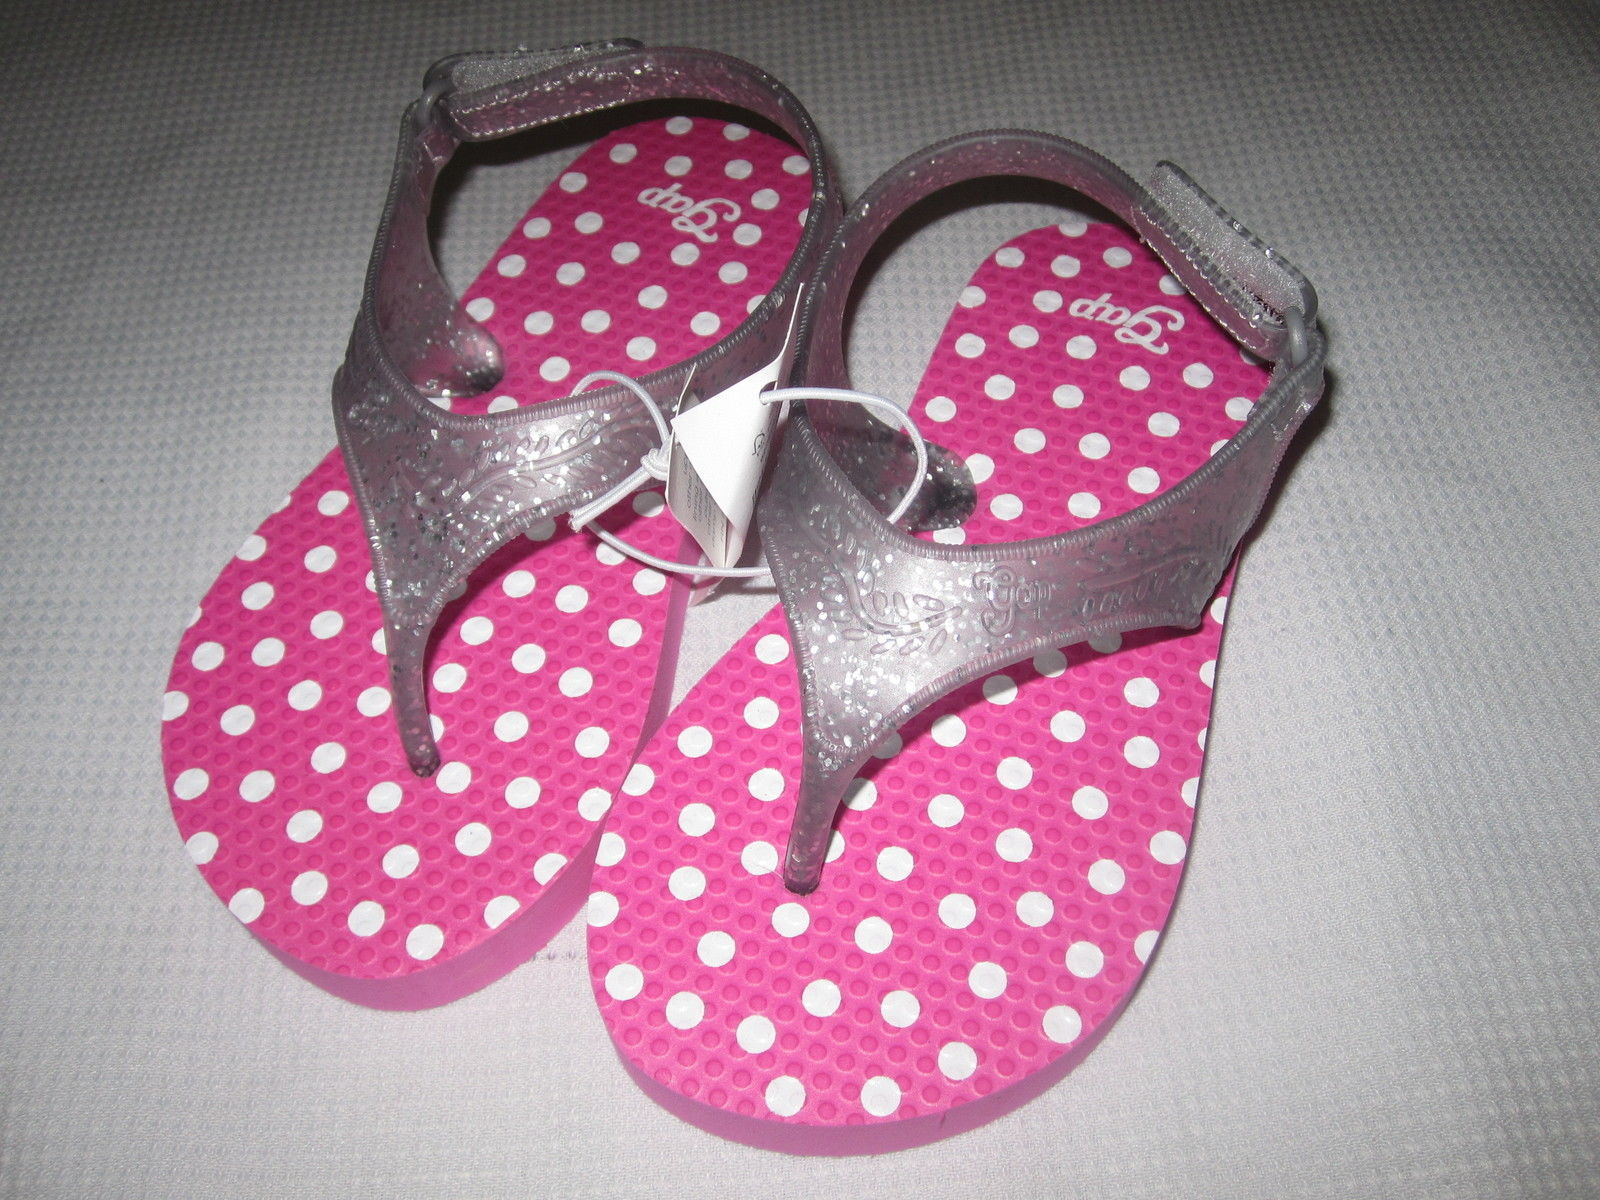 NWT Baby Gap Pink Polka Dot Flip Flop Sandals Sz 7,8,9,10